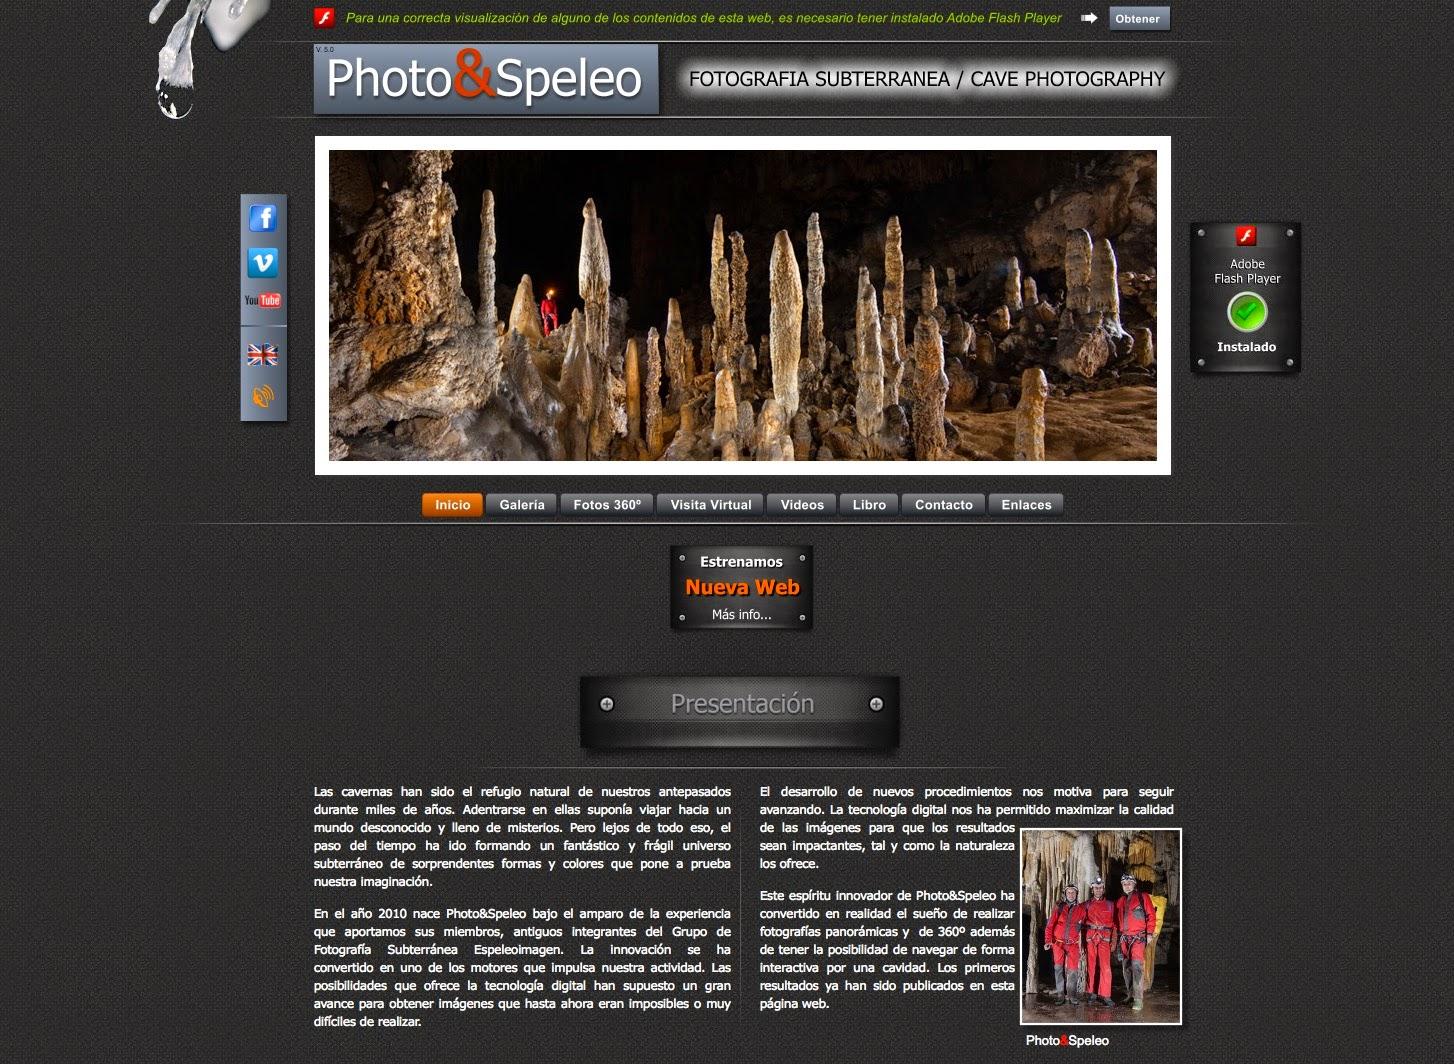 http://photoandspeleo.com/index.htm